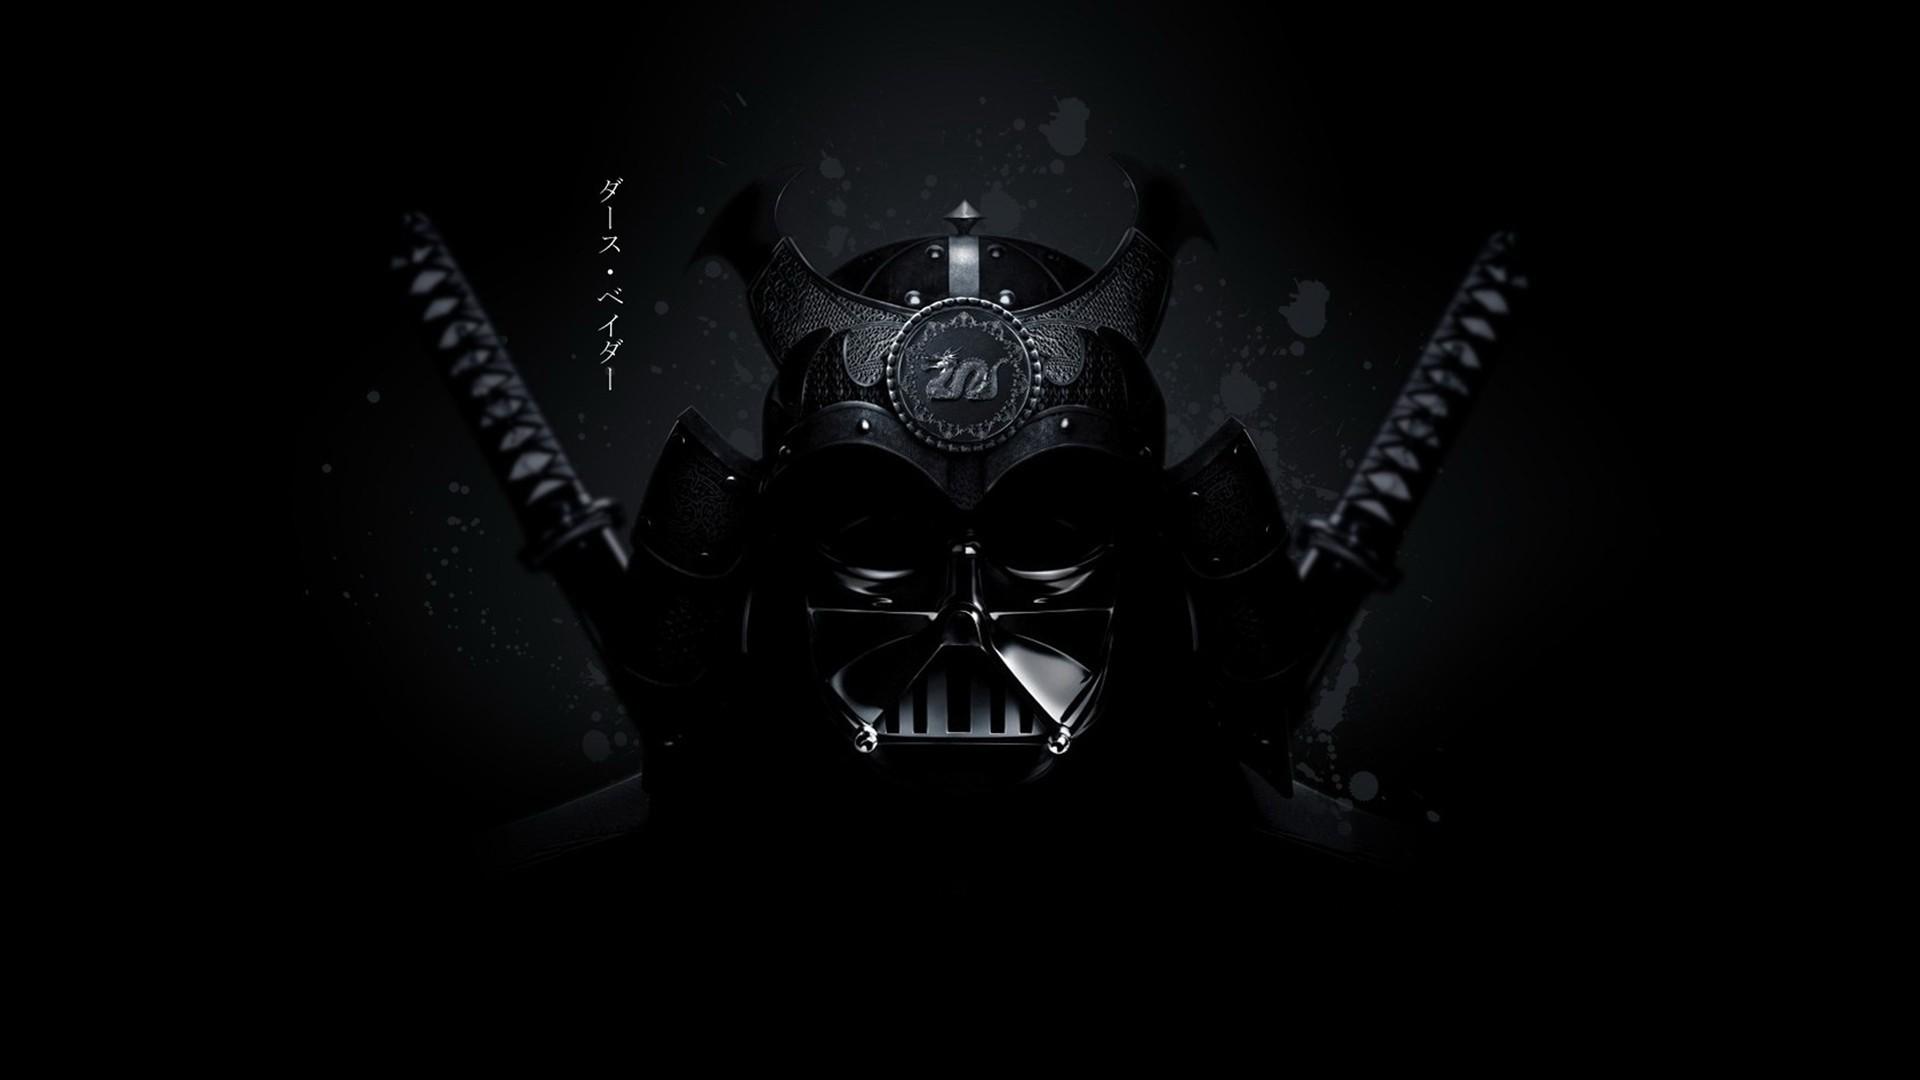 General 1920x1080 Star Wars katana samurai Darth Vader black background Star Wars Villains